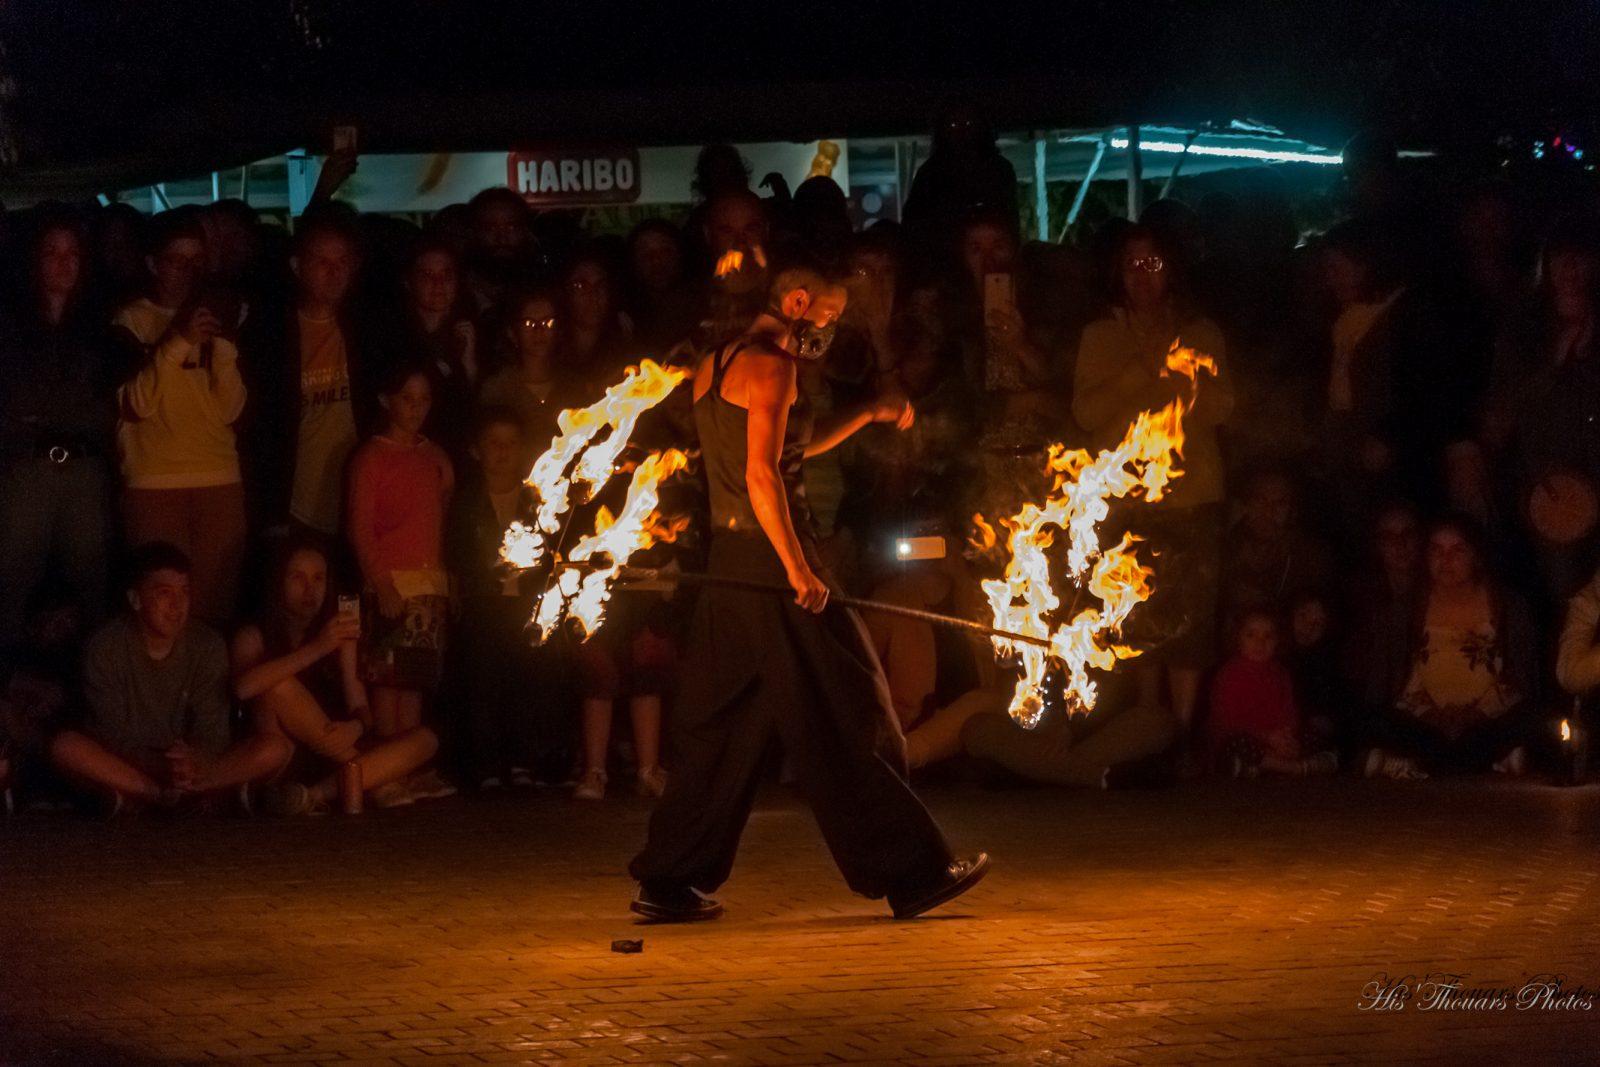 spectacle de feu,jongleurs de feu, compagnie belizama, cracheurs de feu, spectacle de rue, spectacle de feu bretagne, spectacle pyrotechnique, belizama, bretagne,spectacle de feu normandie